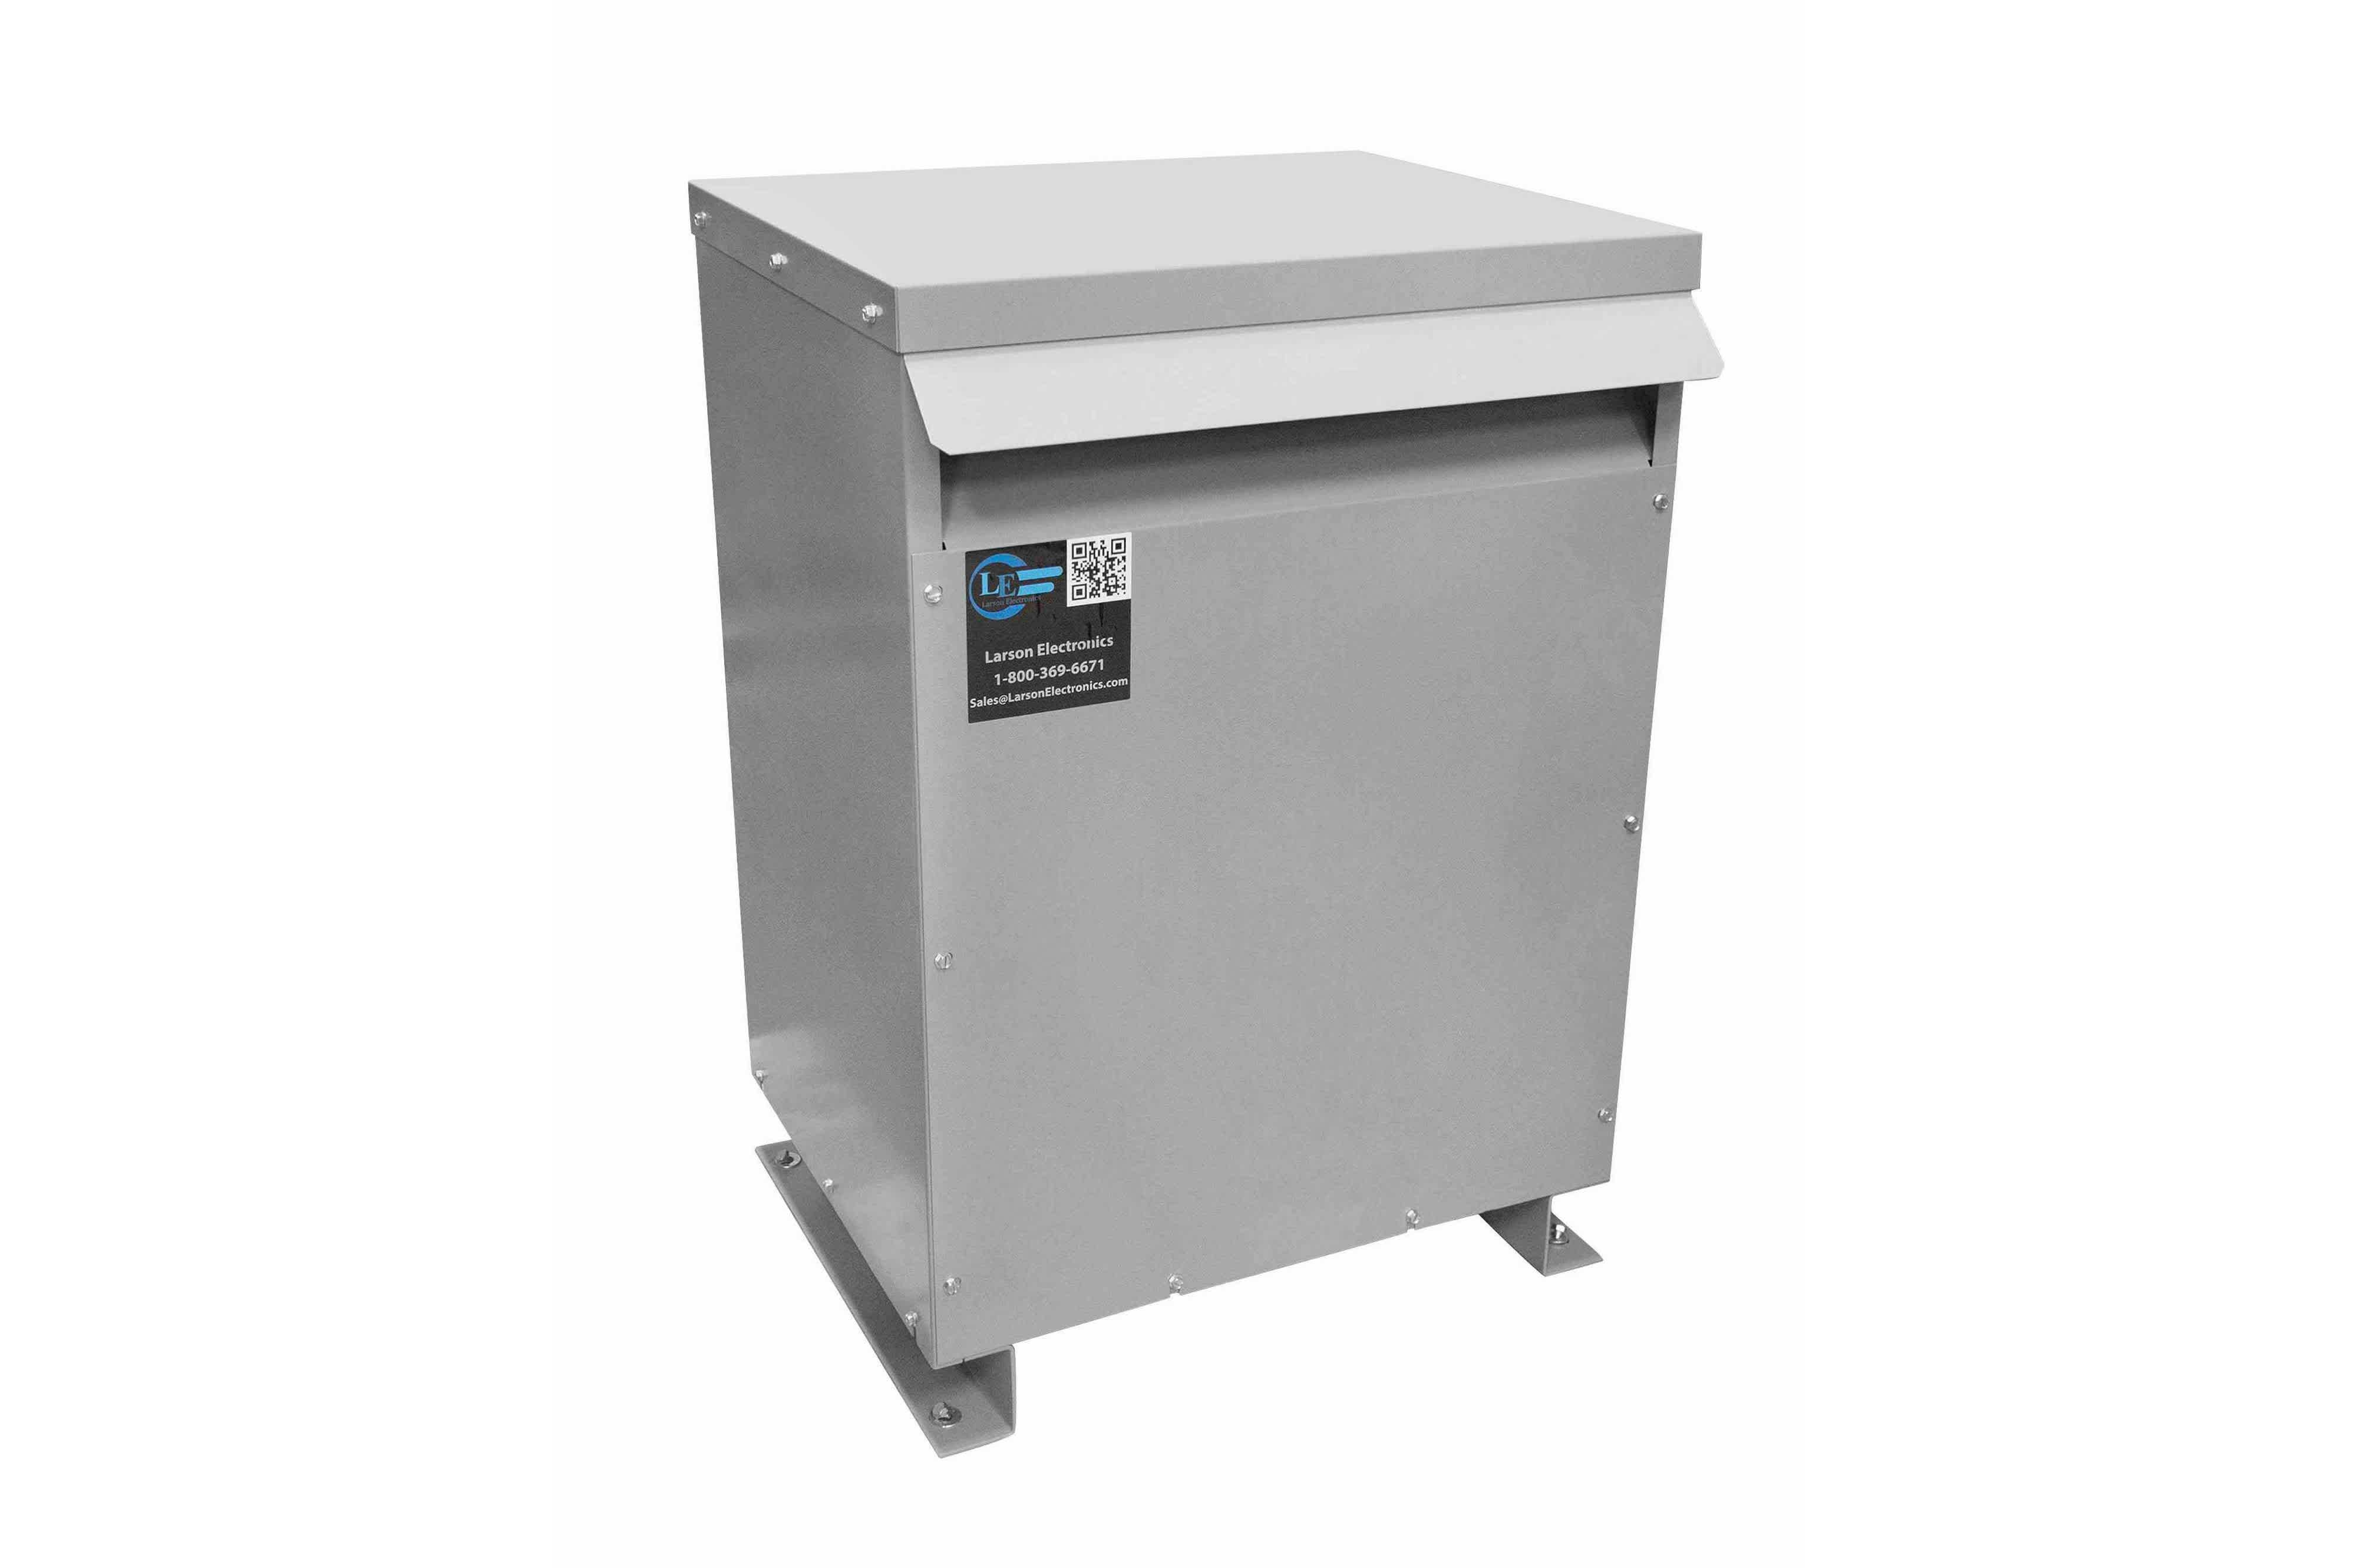 50 kVA 3PH Isolation Transformer, 480V Wye Primary, 480Y/277 Wye-N Secondary, N3R, Ventilated, 60 Hz